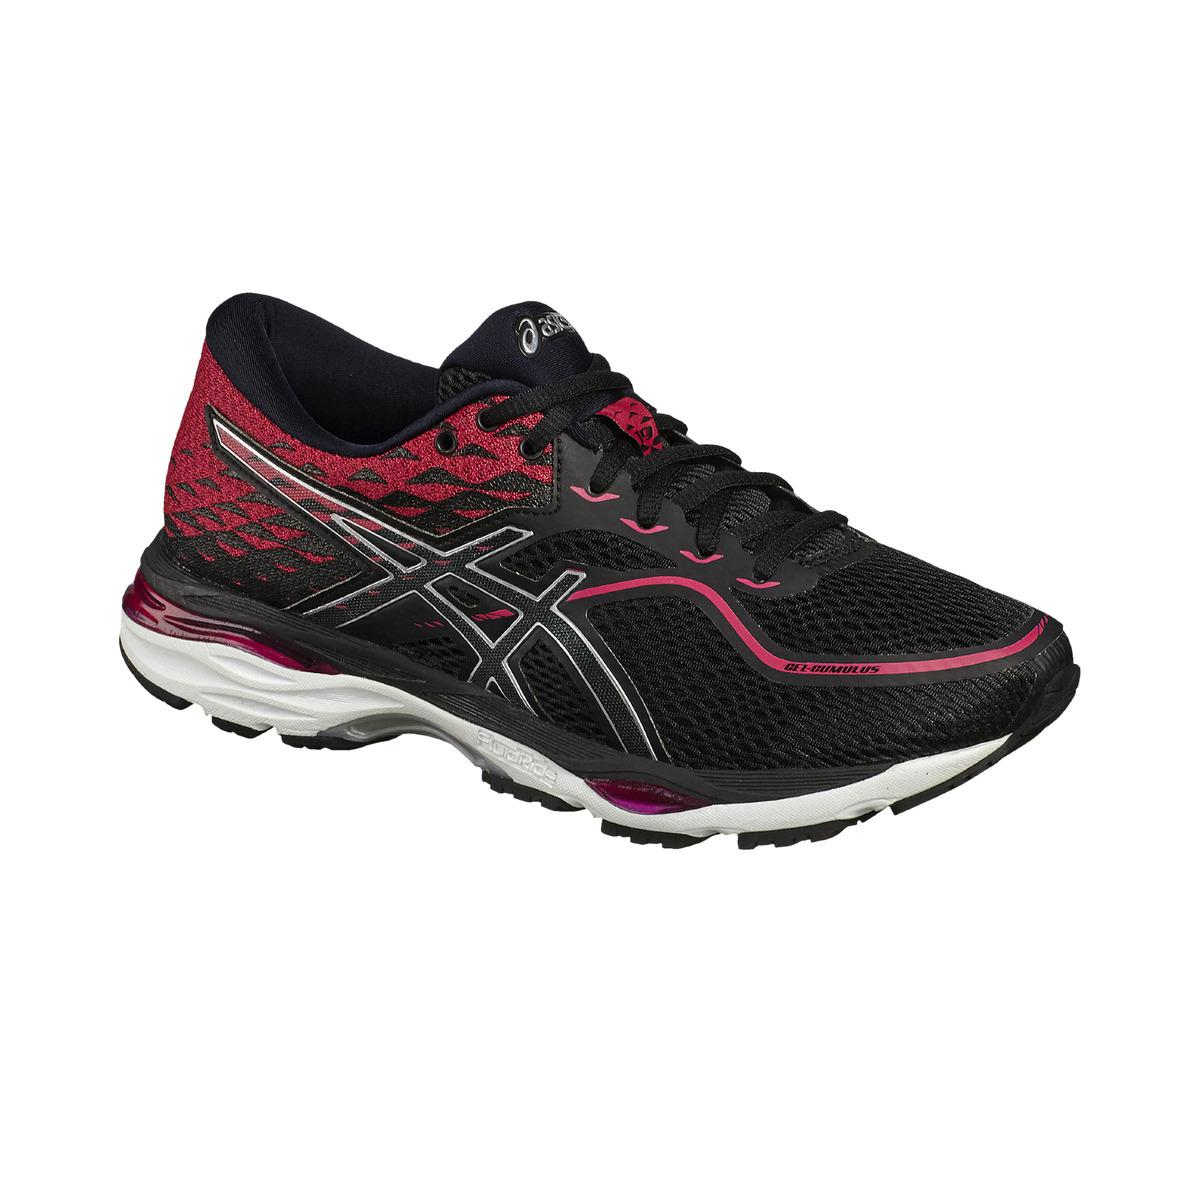 ac46cef7382f Asics - Black Gel-cumulus 19 Running Shoes - Lyst. View fullscreen